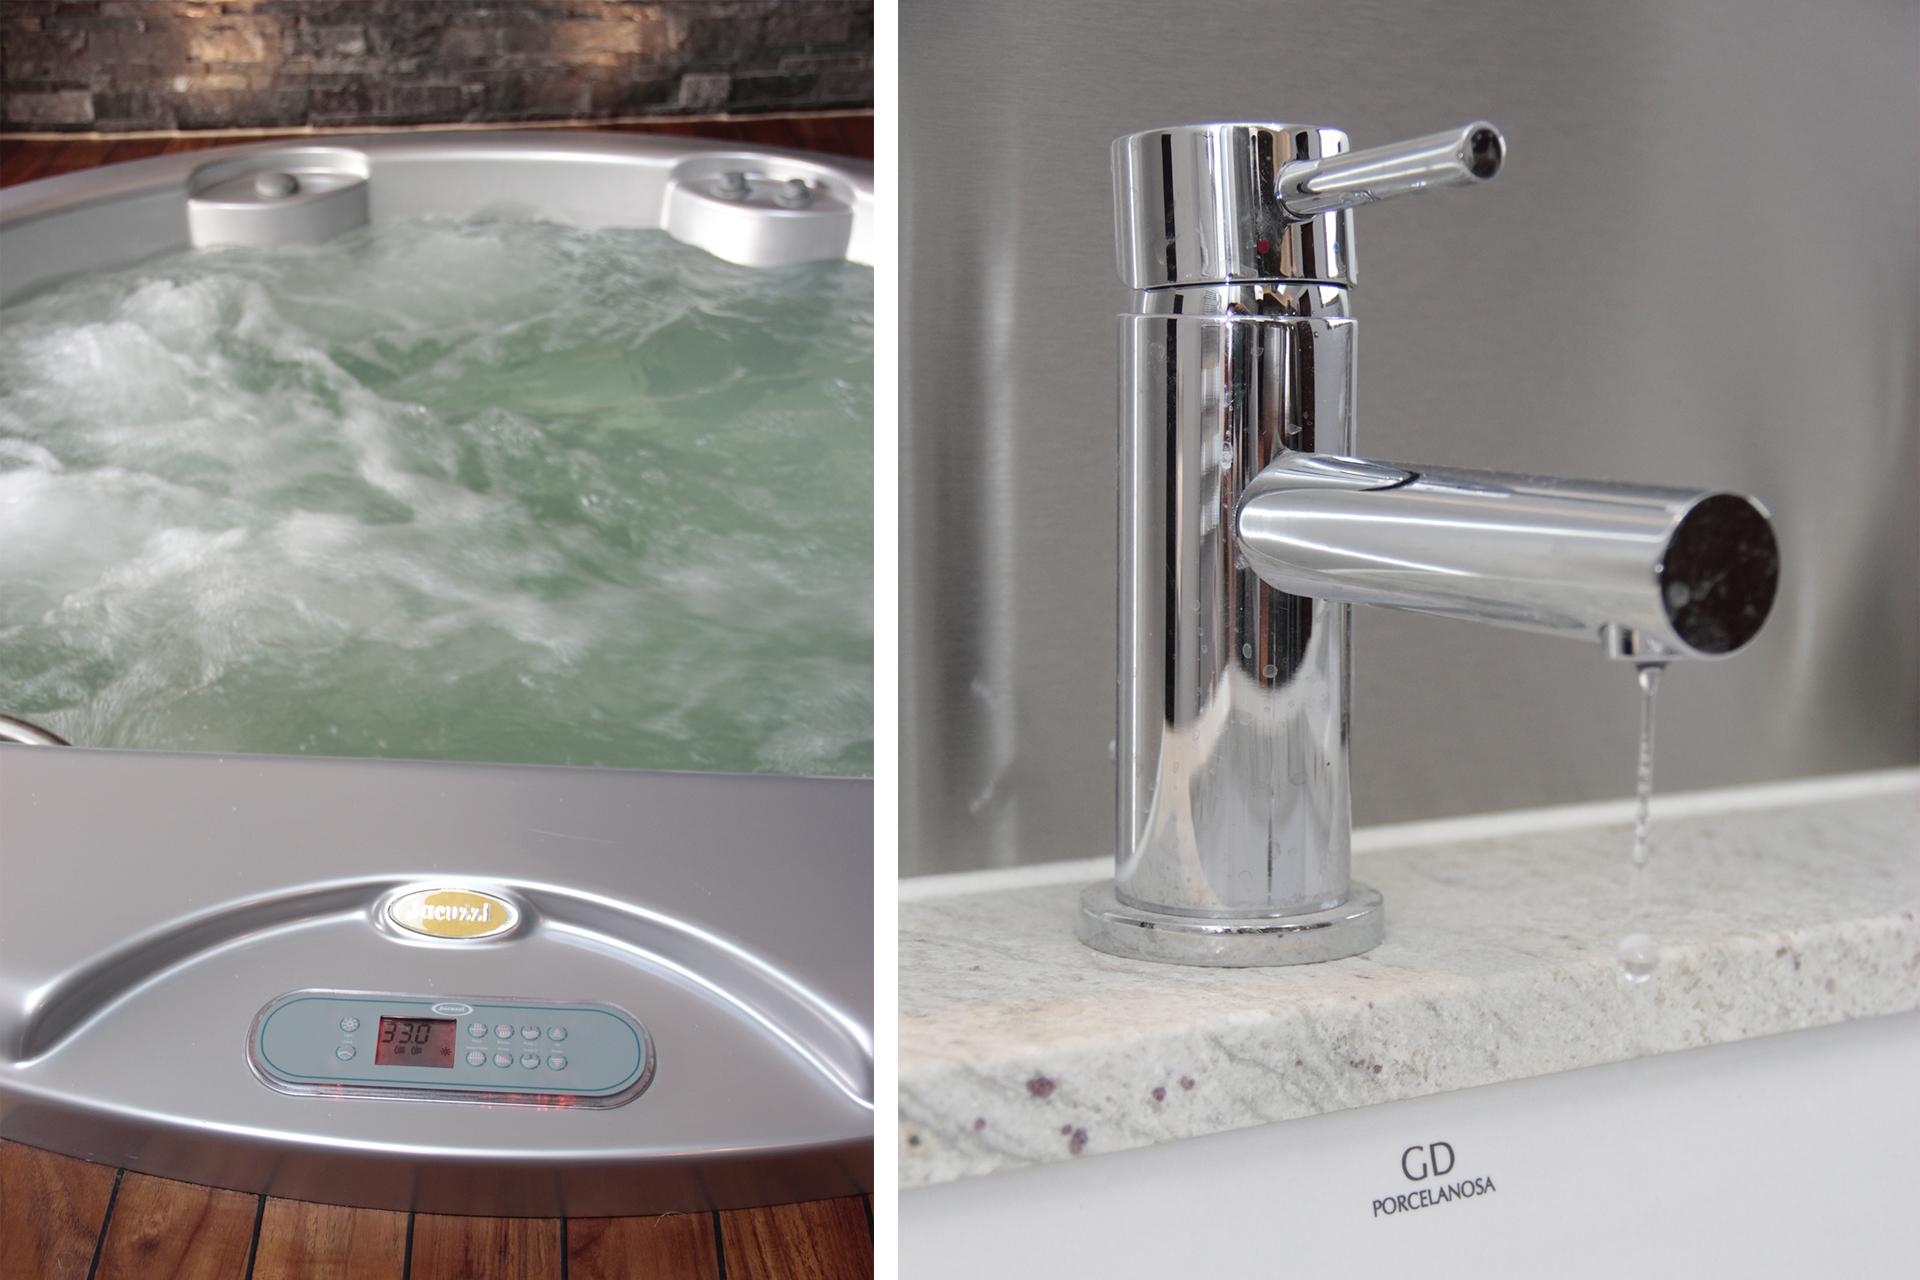 spa jacuzzi et robinet porcelanosa jou plomberie chauffage. Black Bedroom Furniture Sets. Home Design Ideas